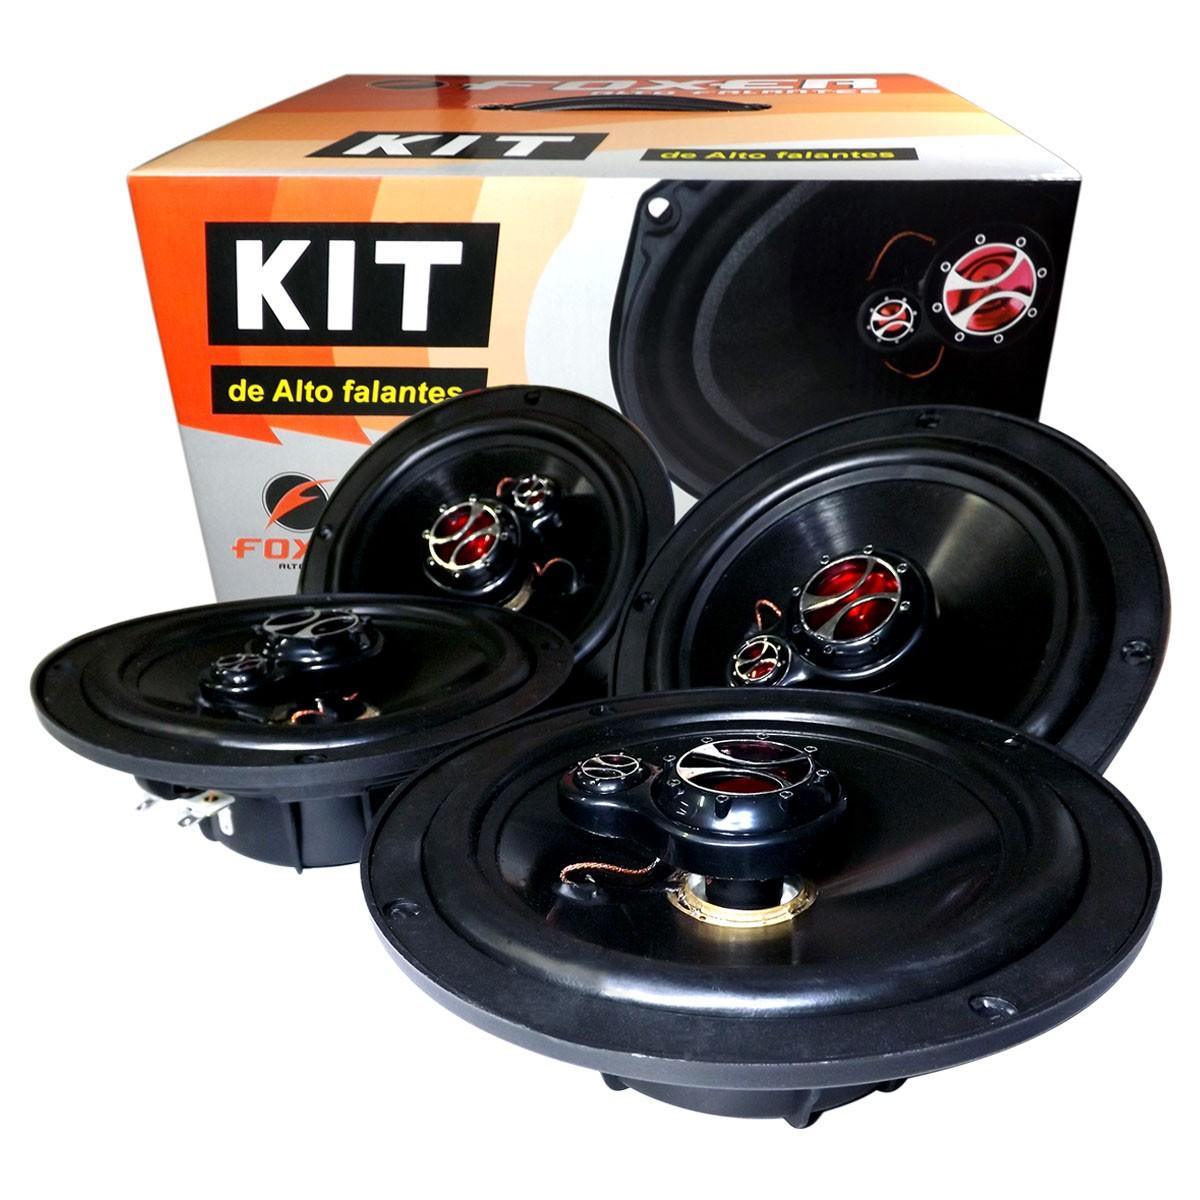 Kit Alto Falante Similar ao Original EcoSport Fiesta Hatch Fiesta Sedan